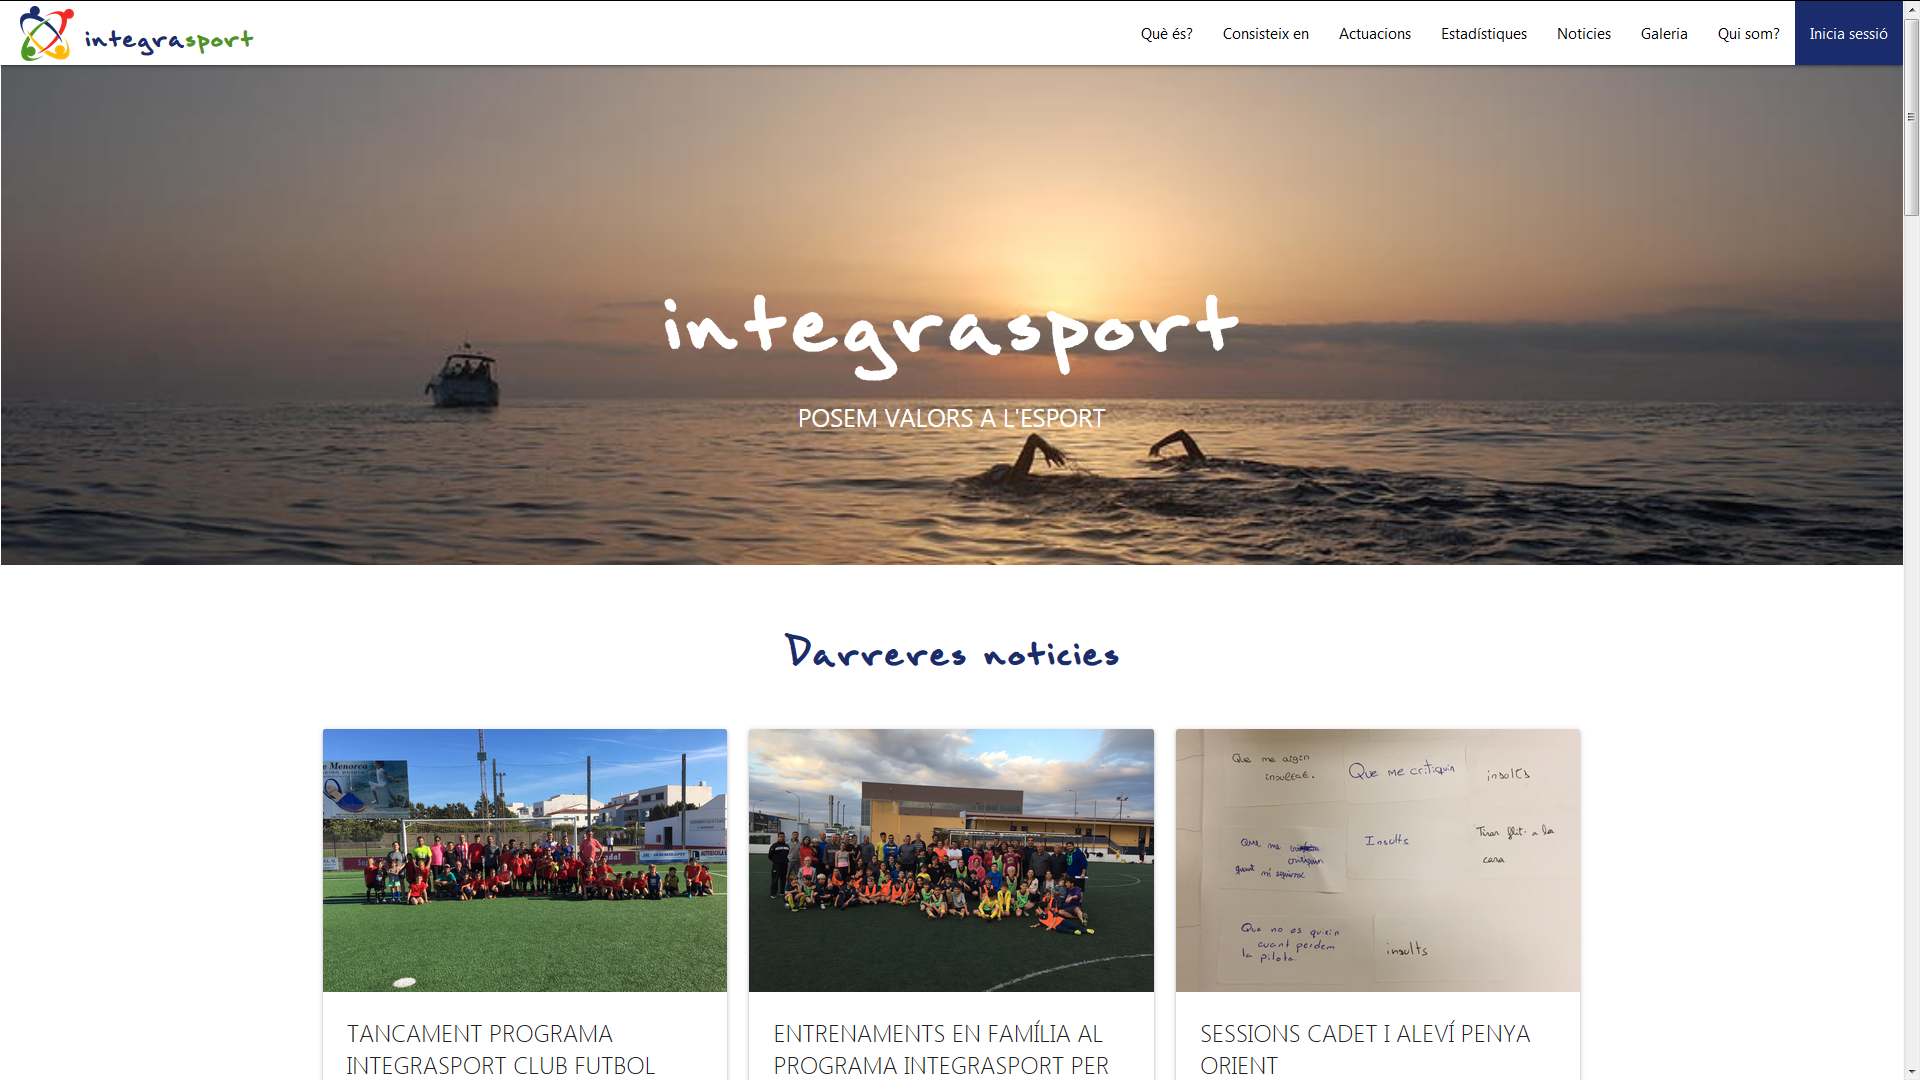 integra esport